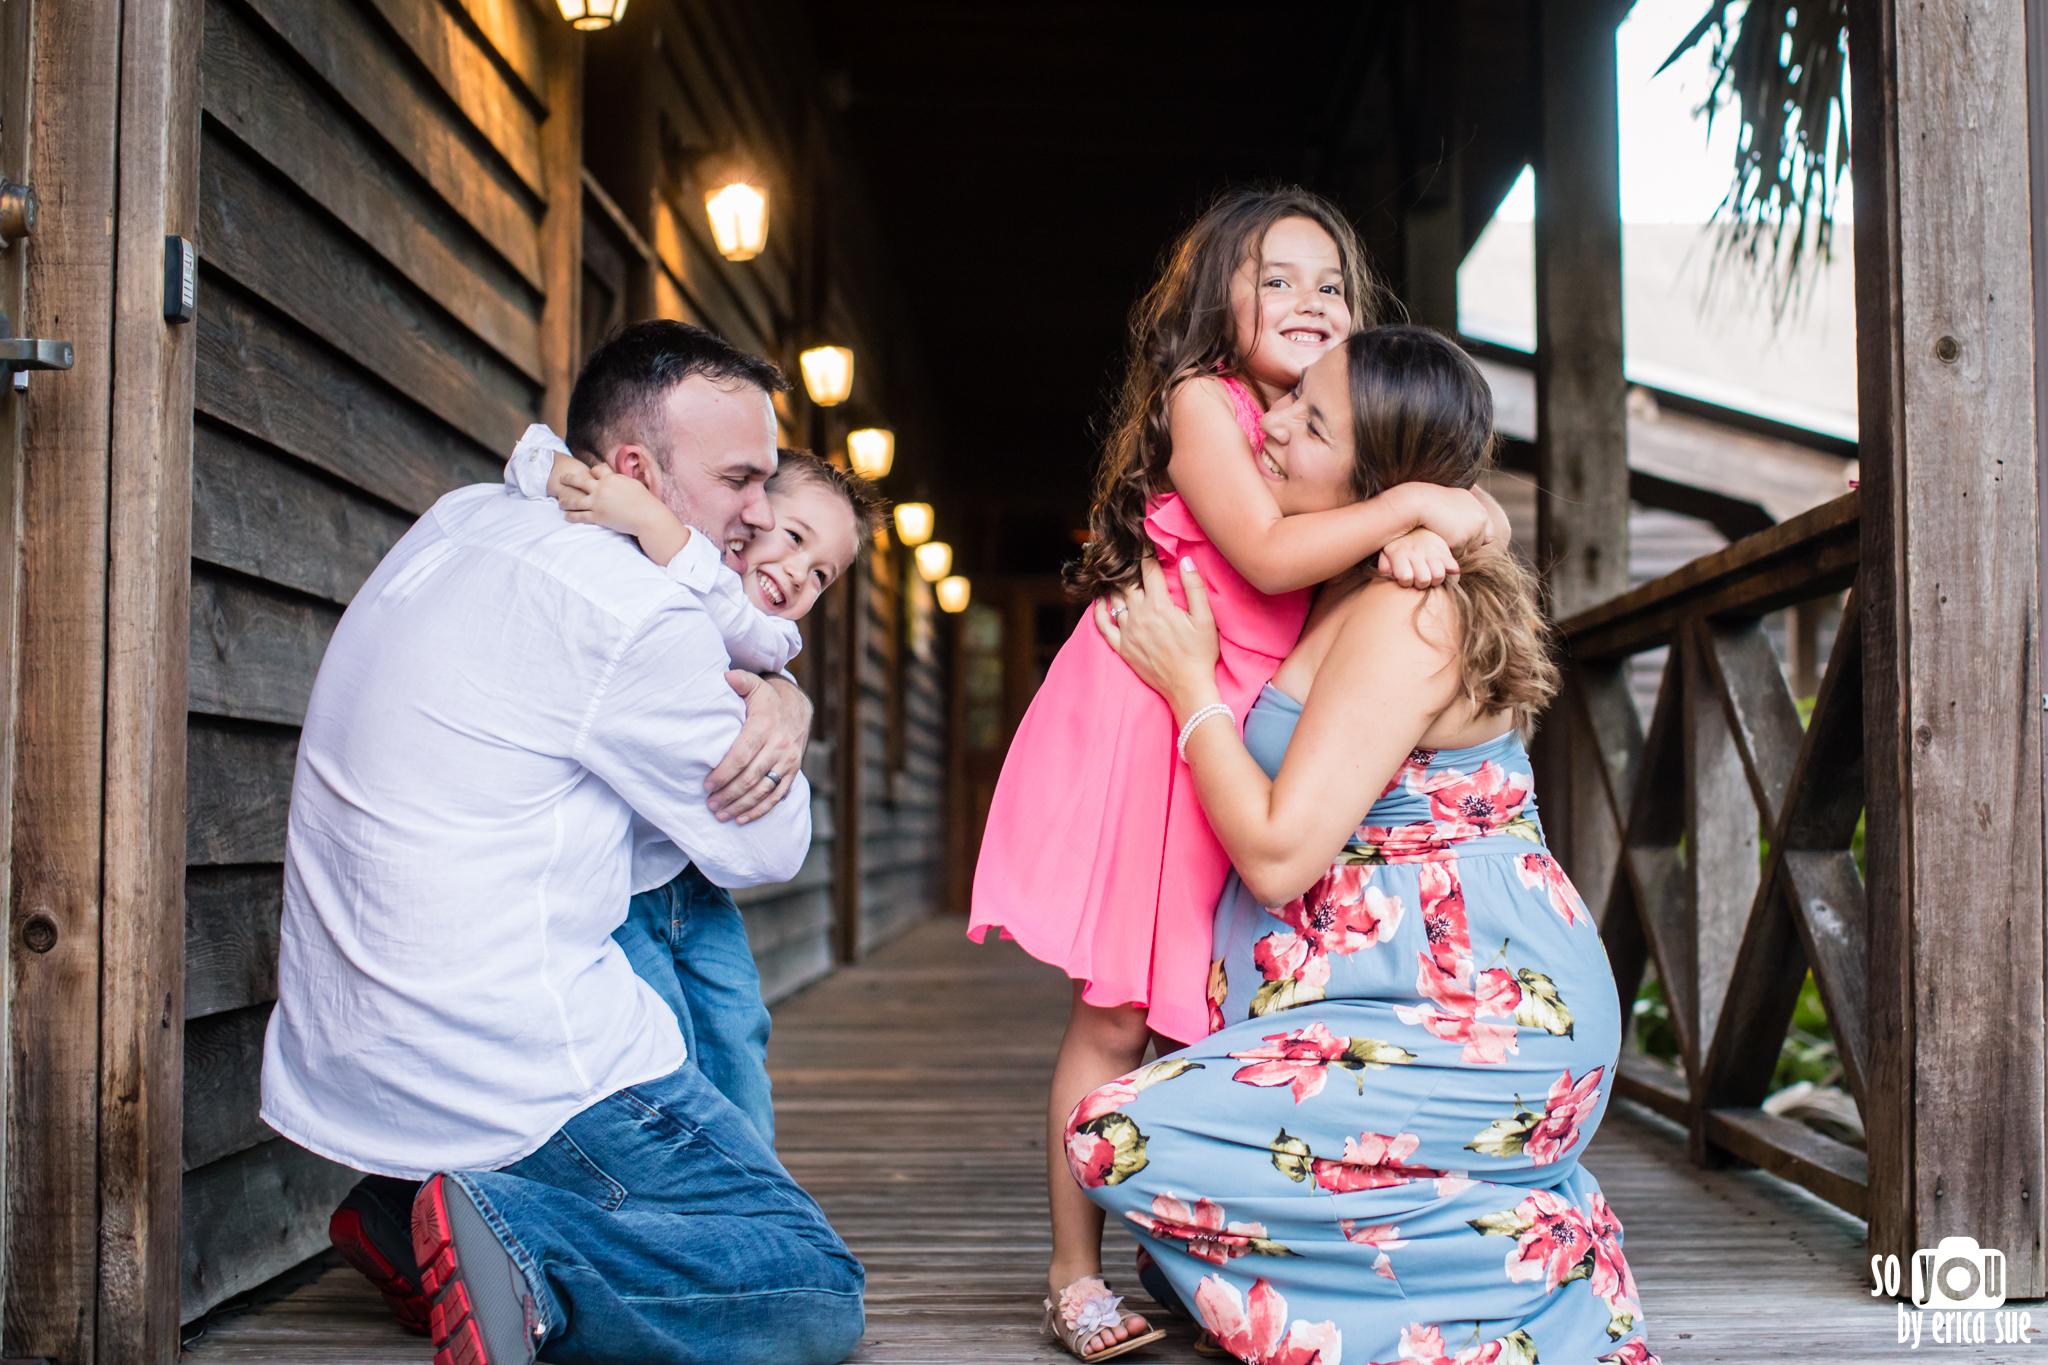 so-you-by-erica-sue-davie-maternity-photographer-fl-7346.jpg